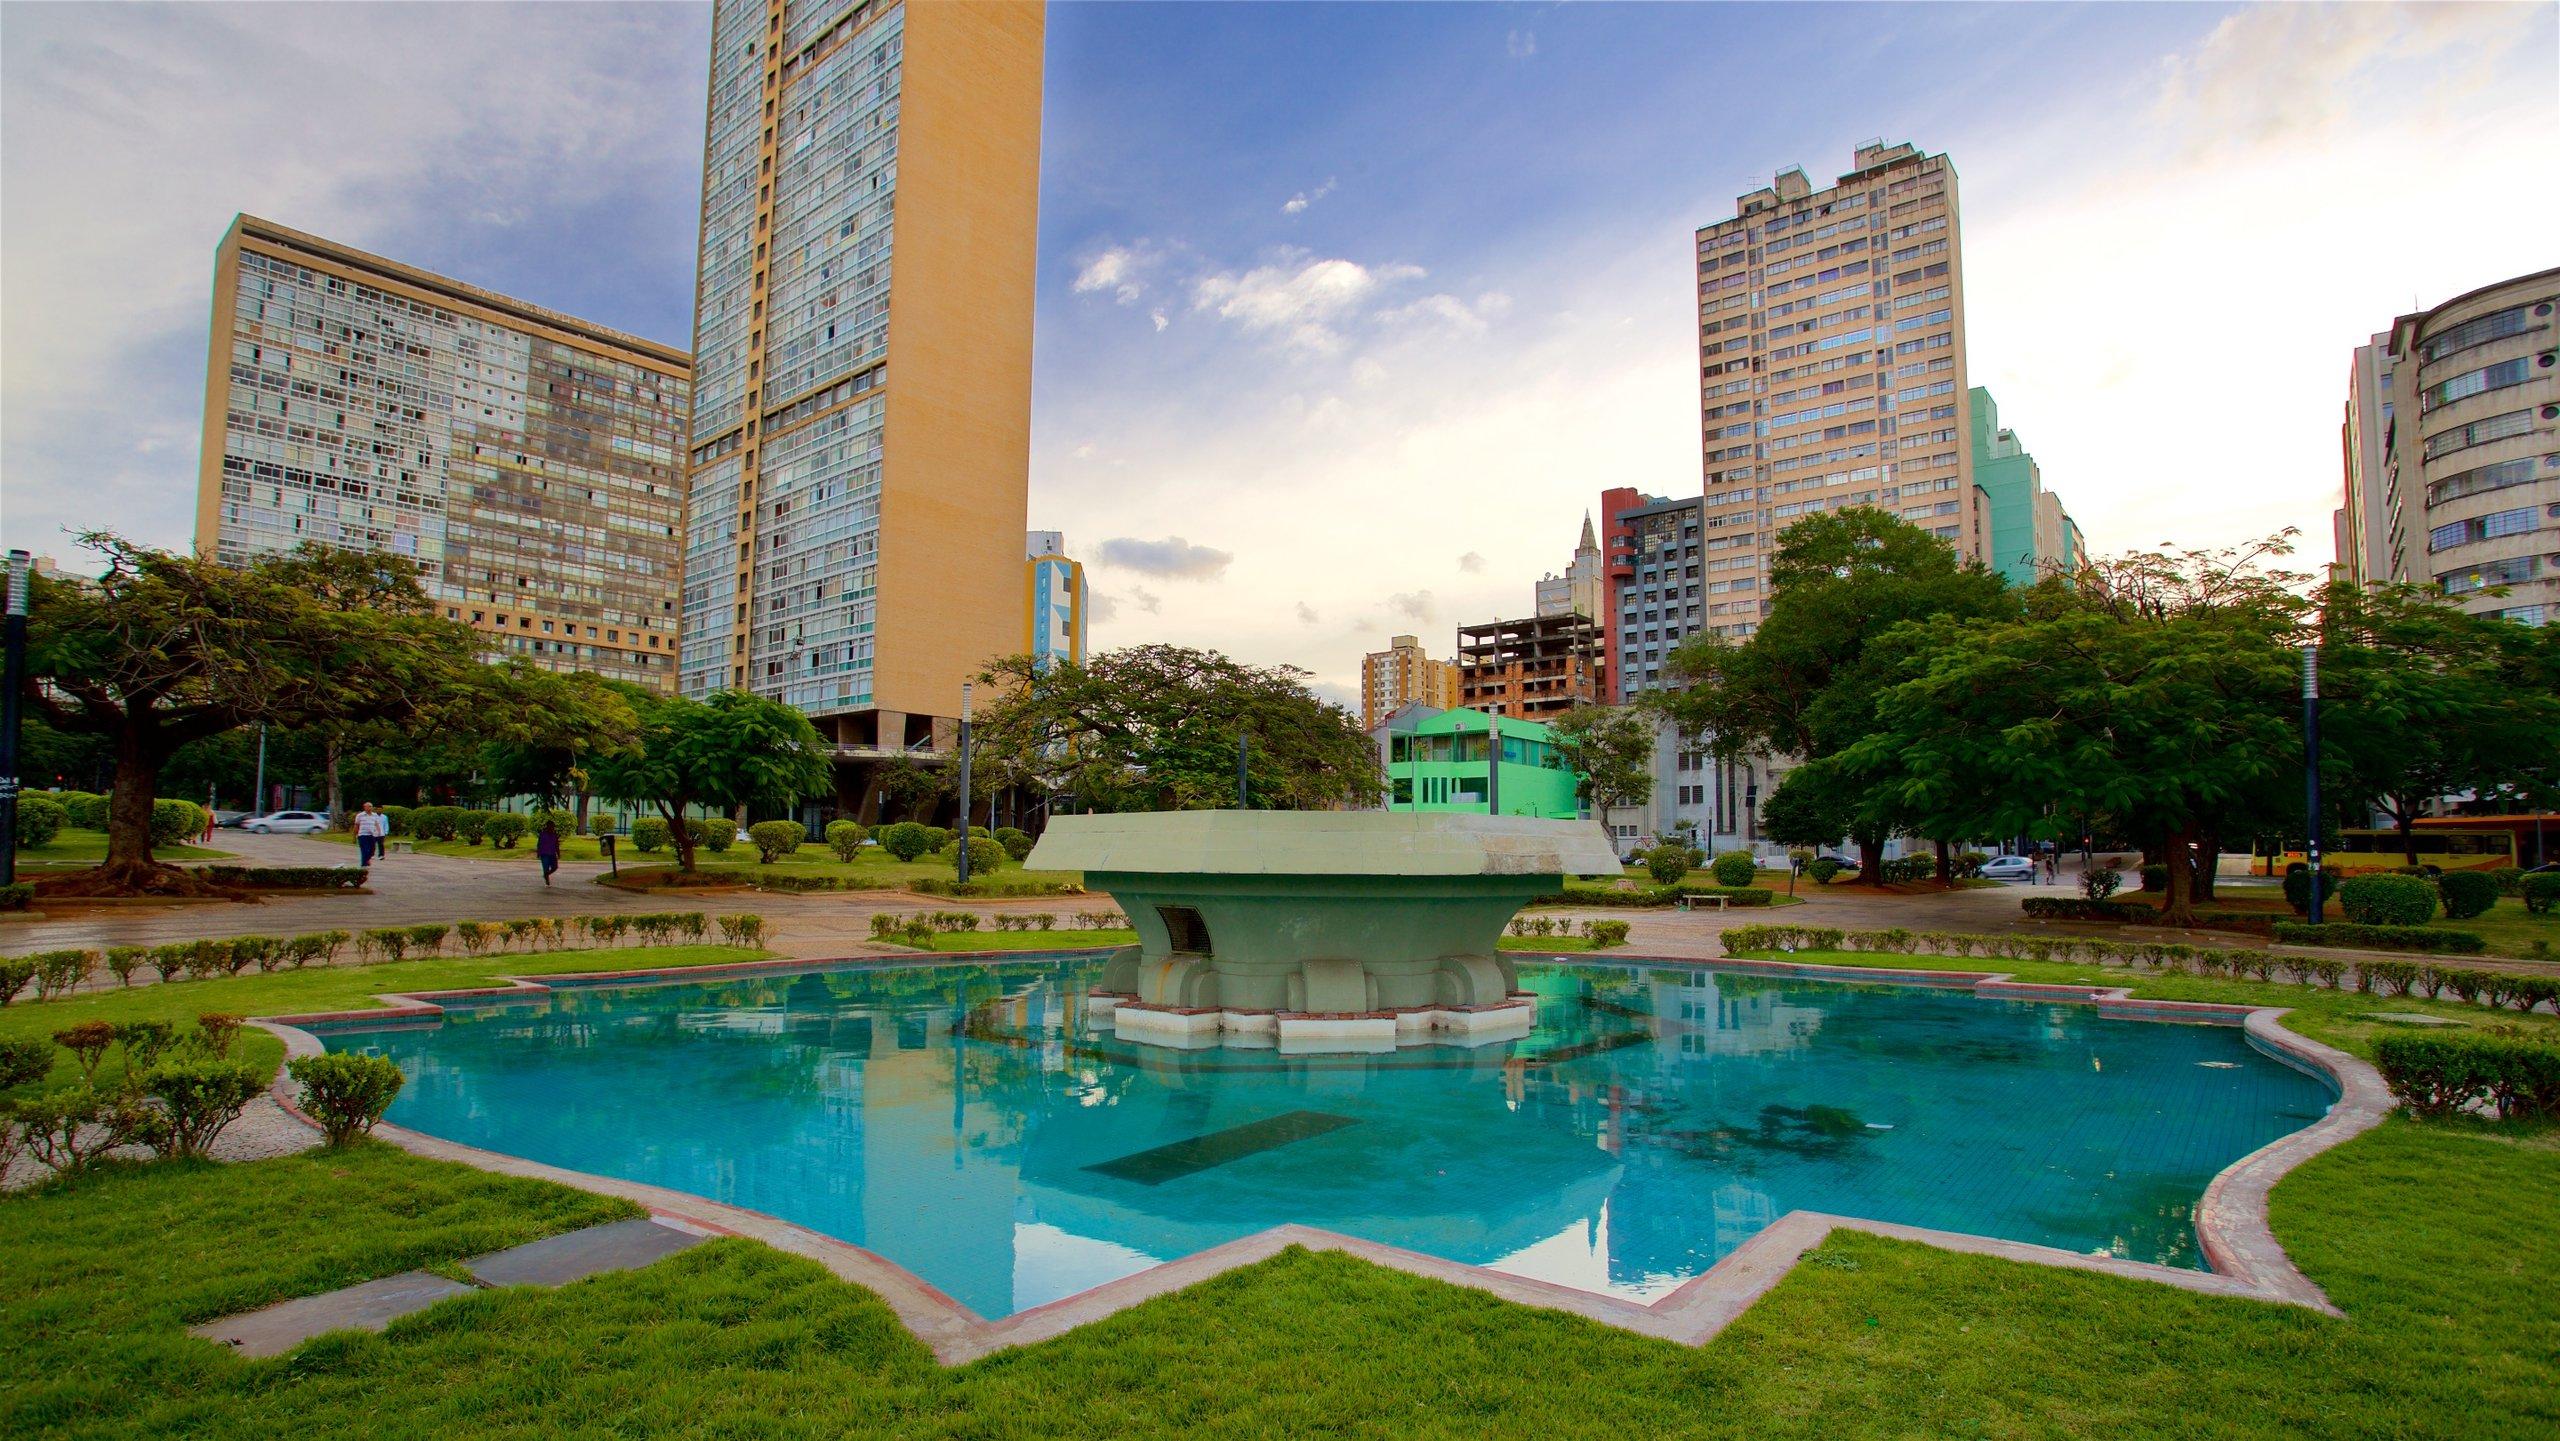 Raul Soares Square, Belo Horizonte, Minas Gerais State, Brazil